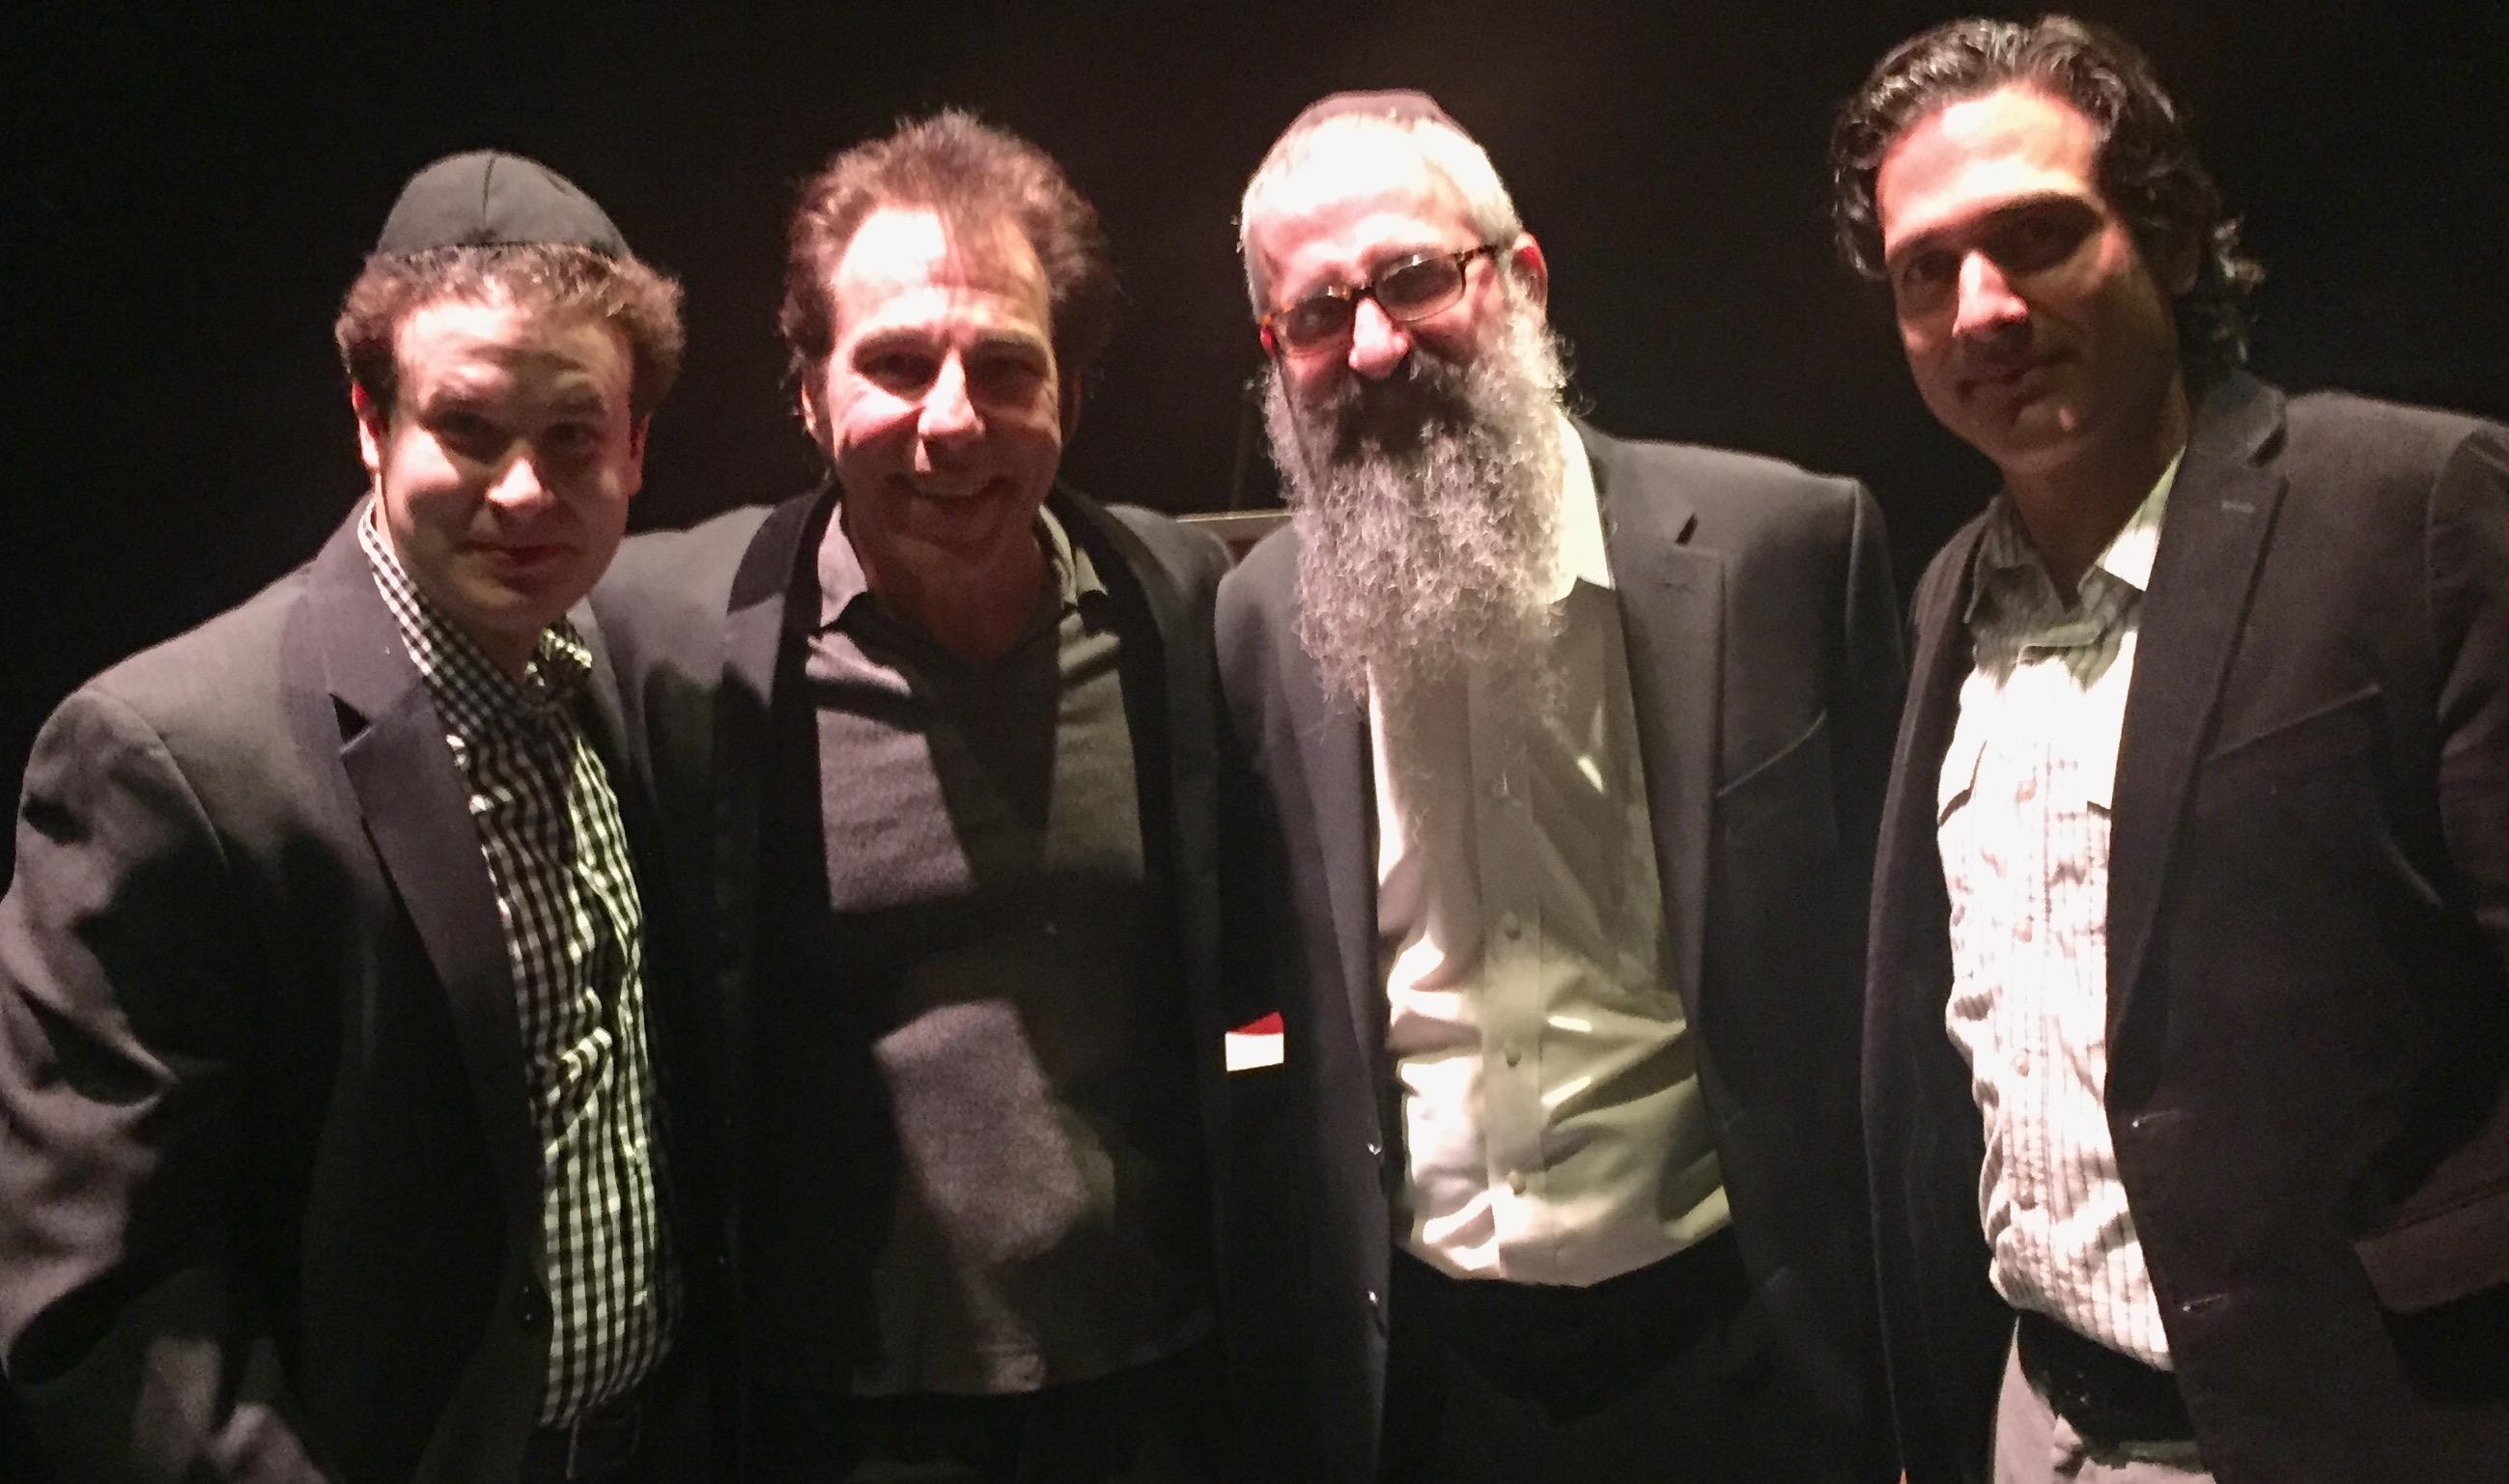 (L-R) Mike Fine, Steve Marshall, Rabbi Zalman Gerber, Kenny Gluck